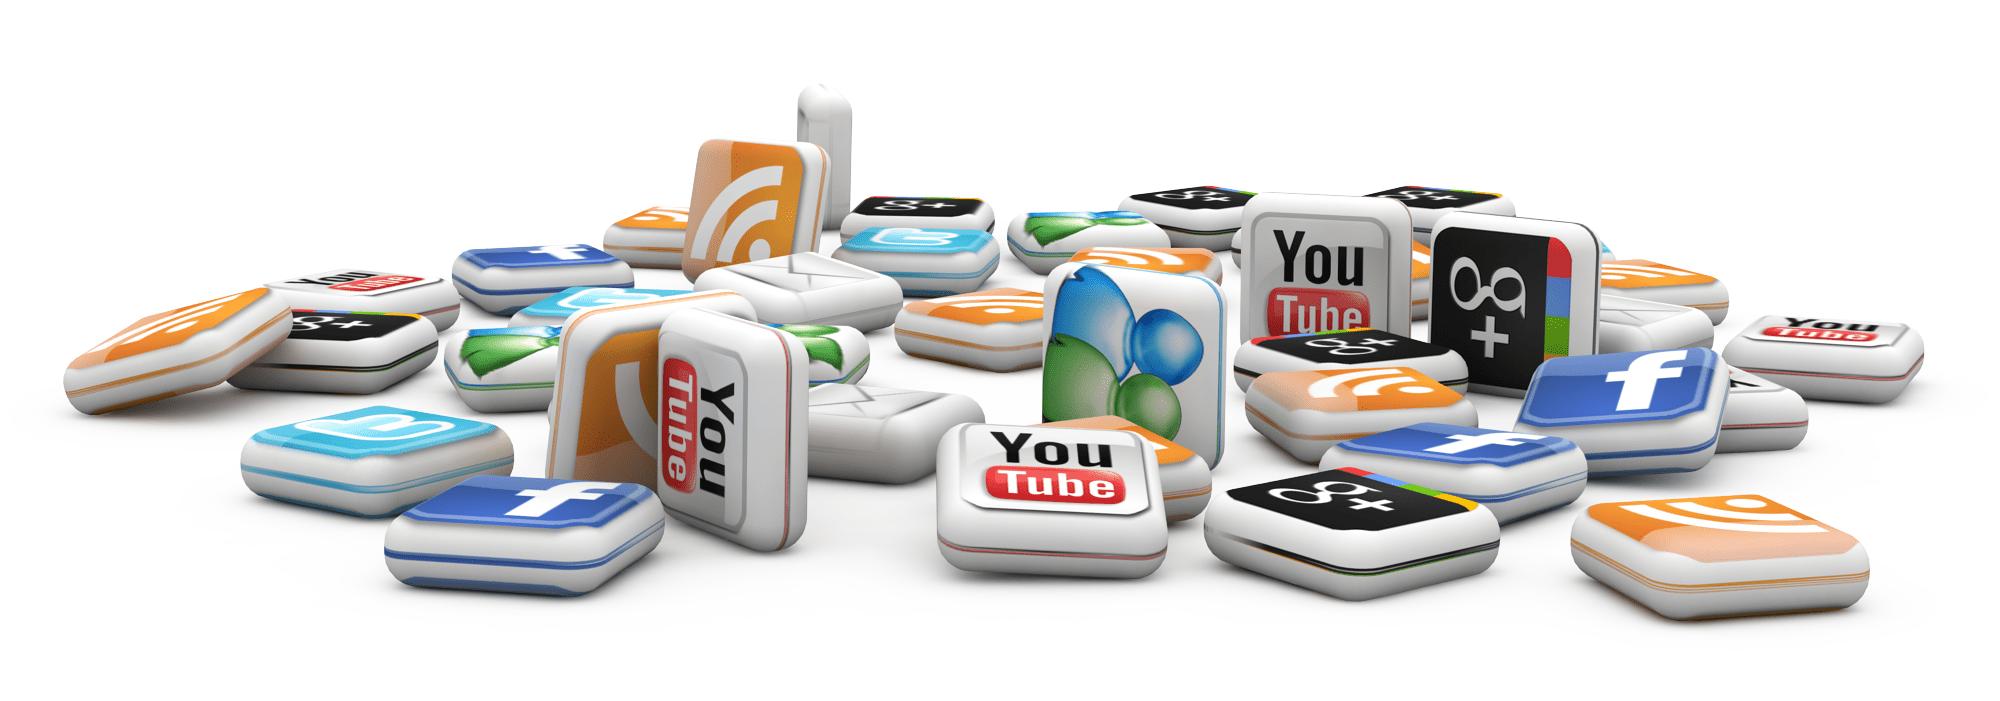 Social Media Marketing Auckland Ultimate Web Designs Limited